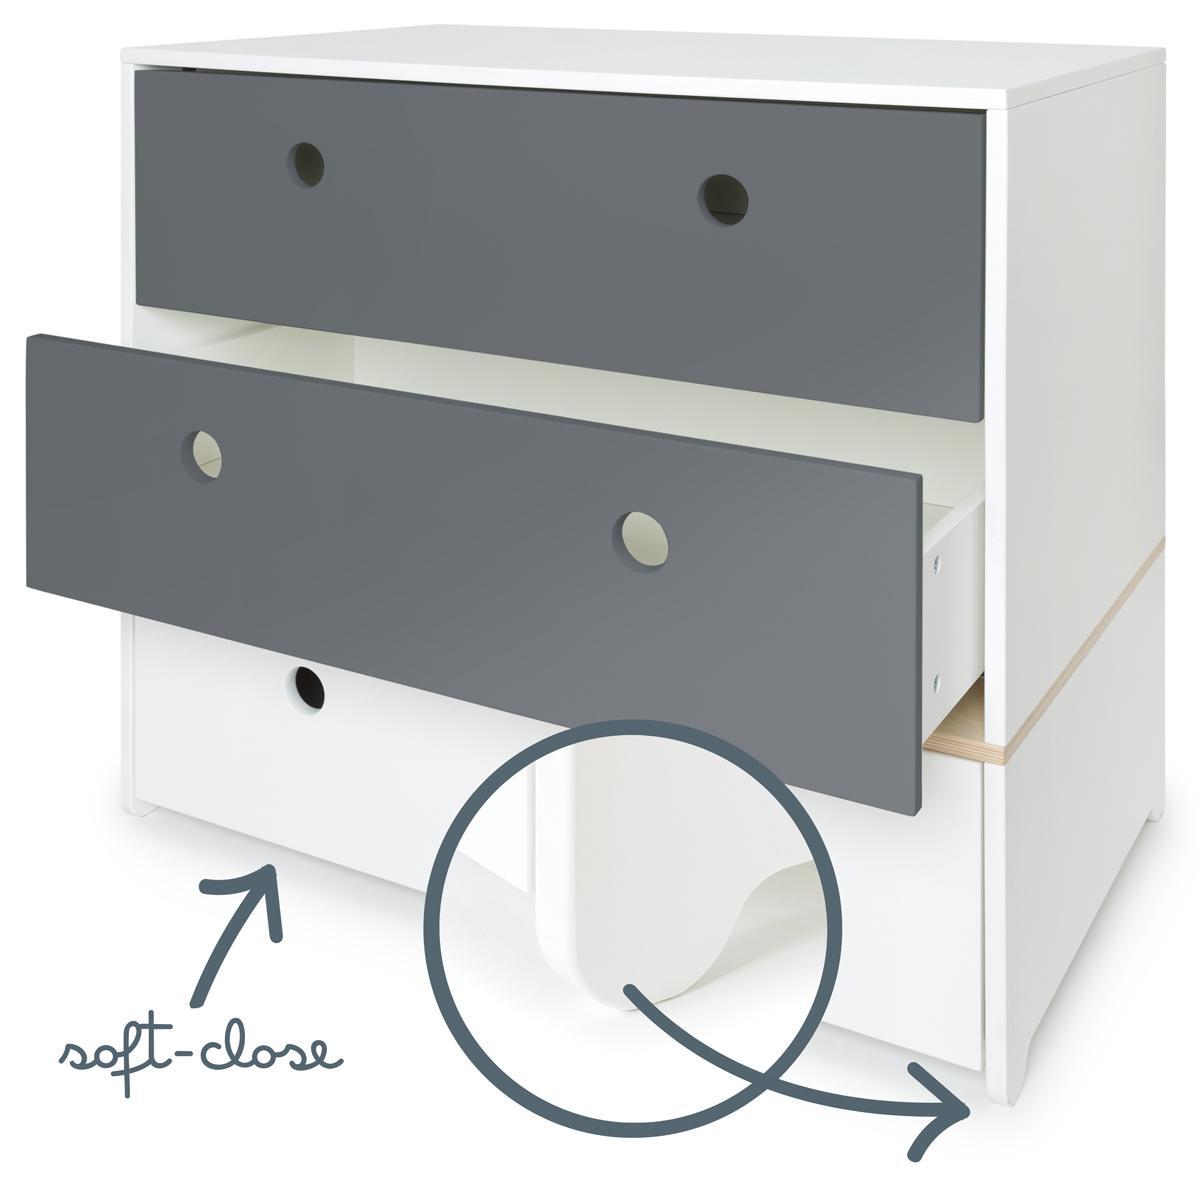 Commode COLORFLEX façades tiroirs space grey-space grey-white